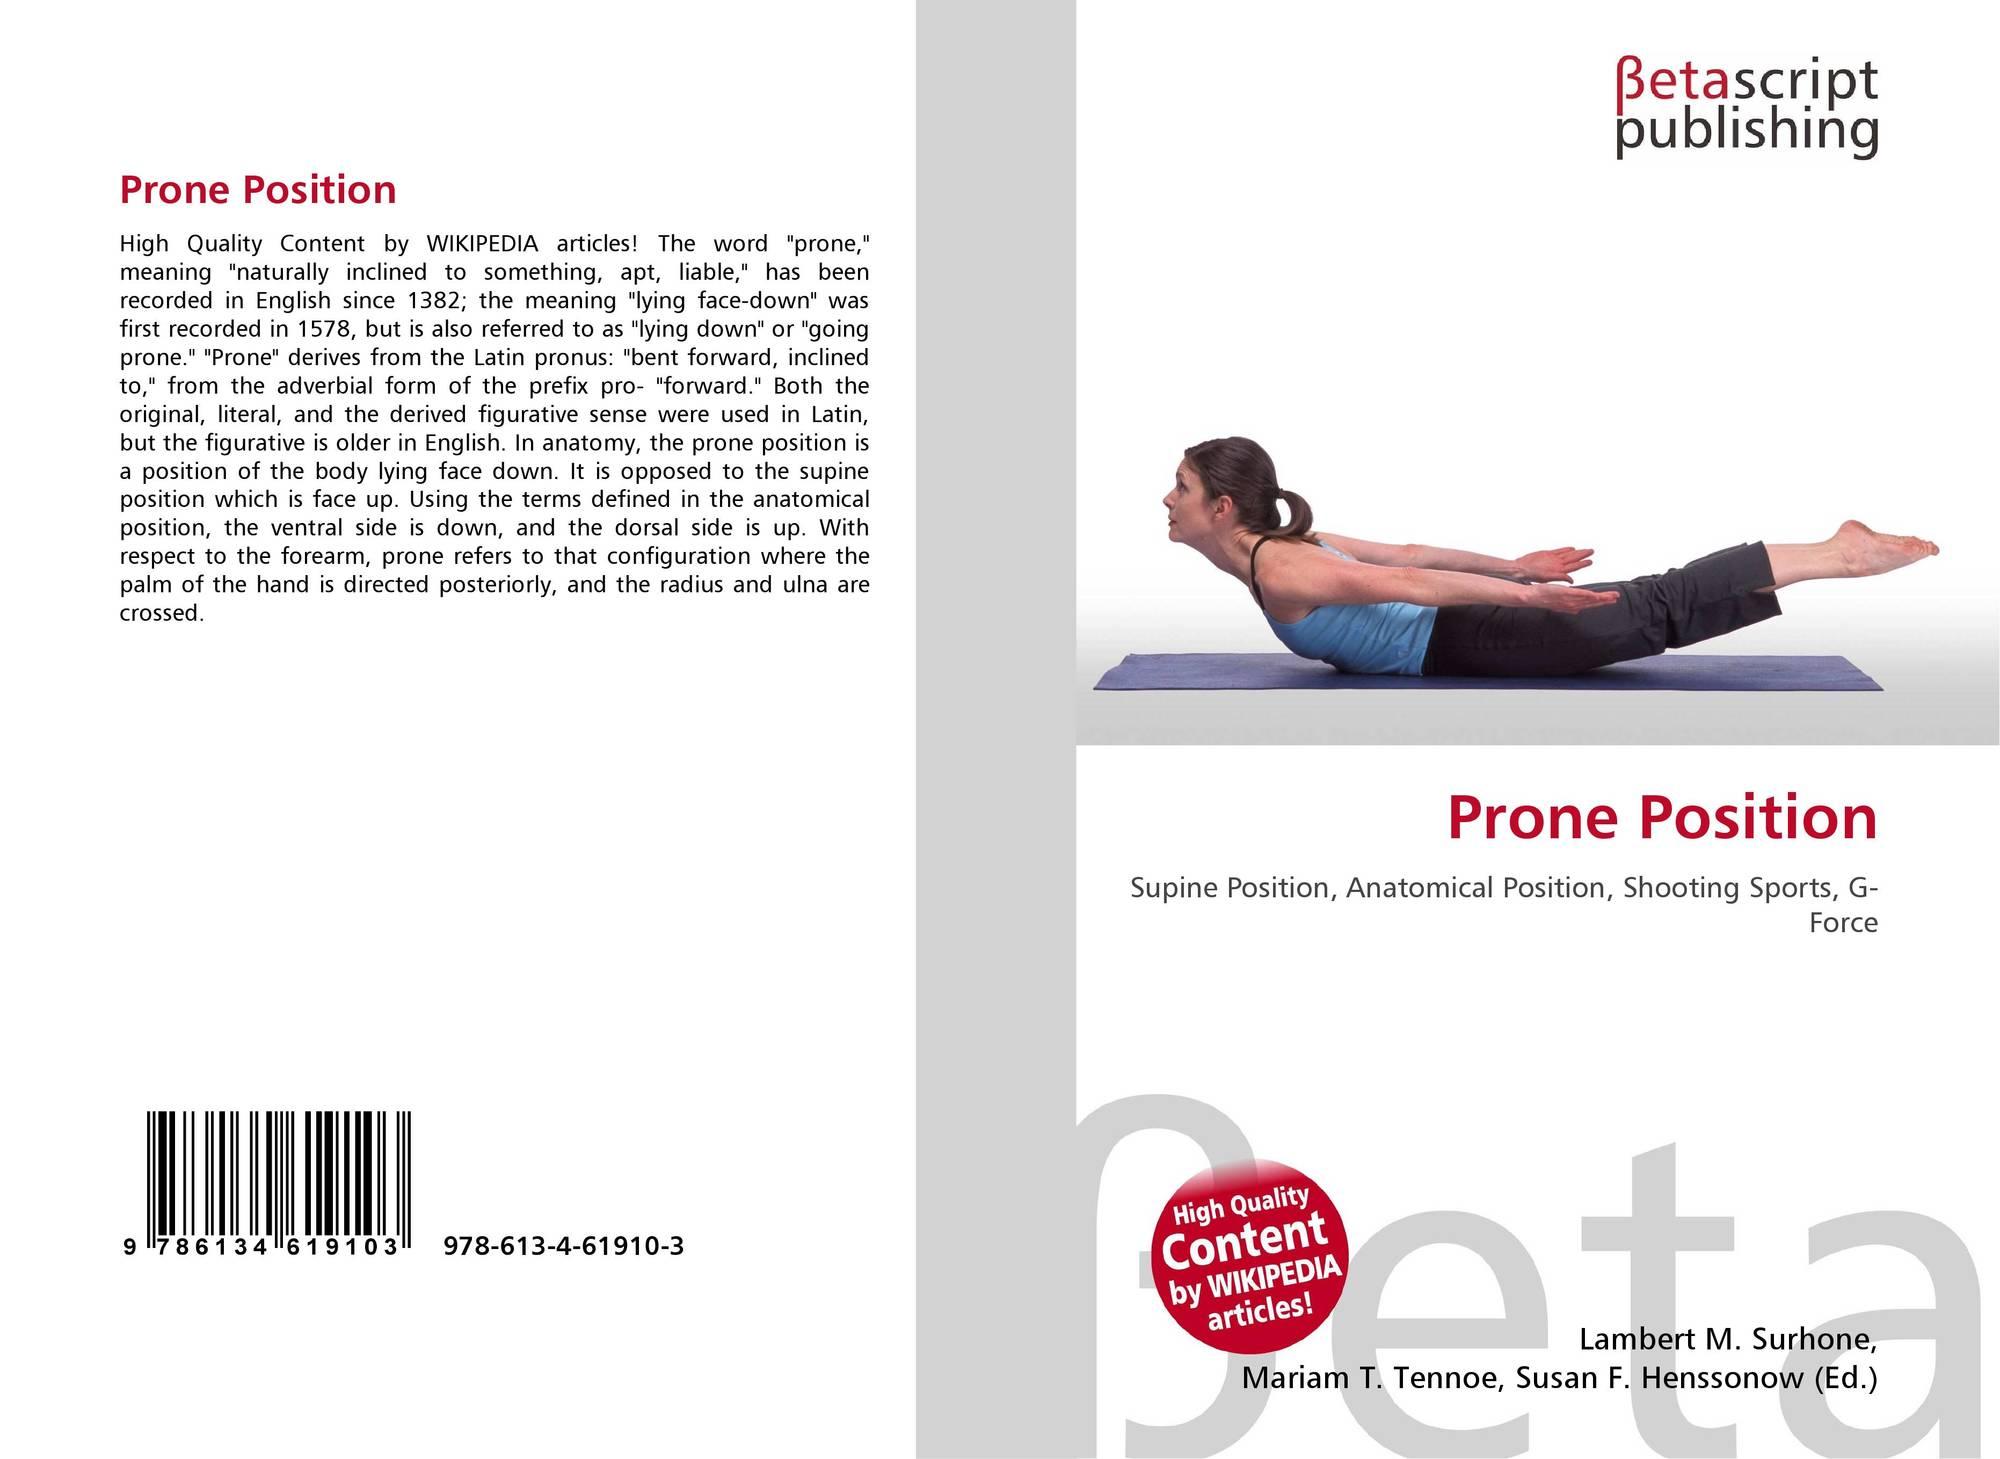 Prone Position, 978-613-4-61910-3, 6134619108 ,9786134619103